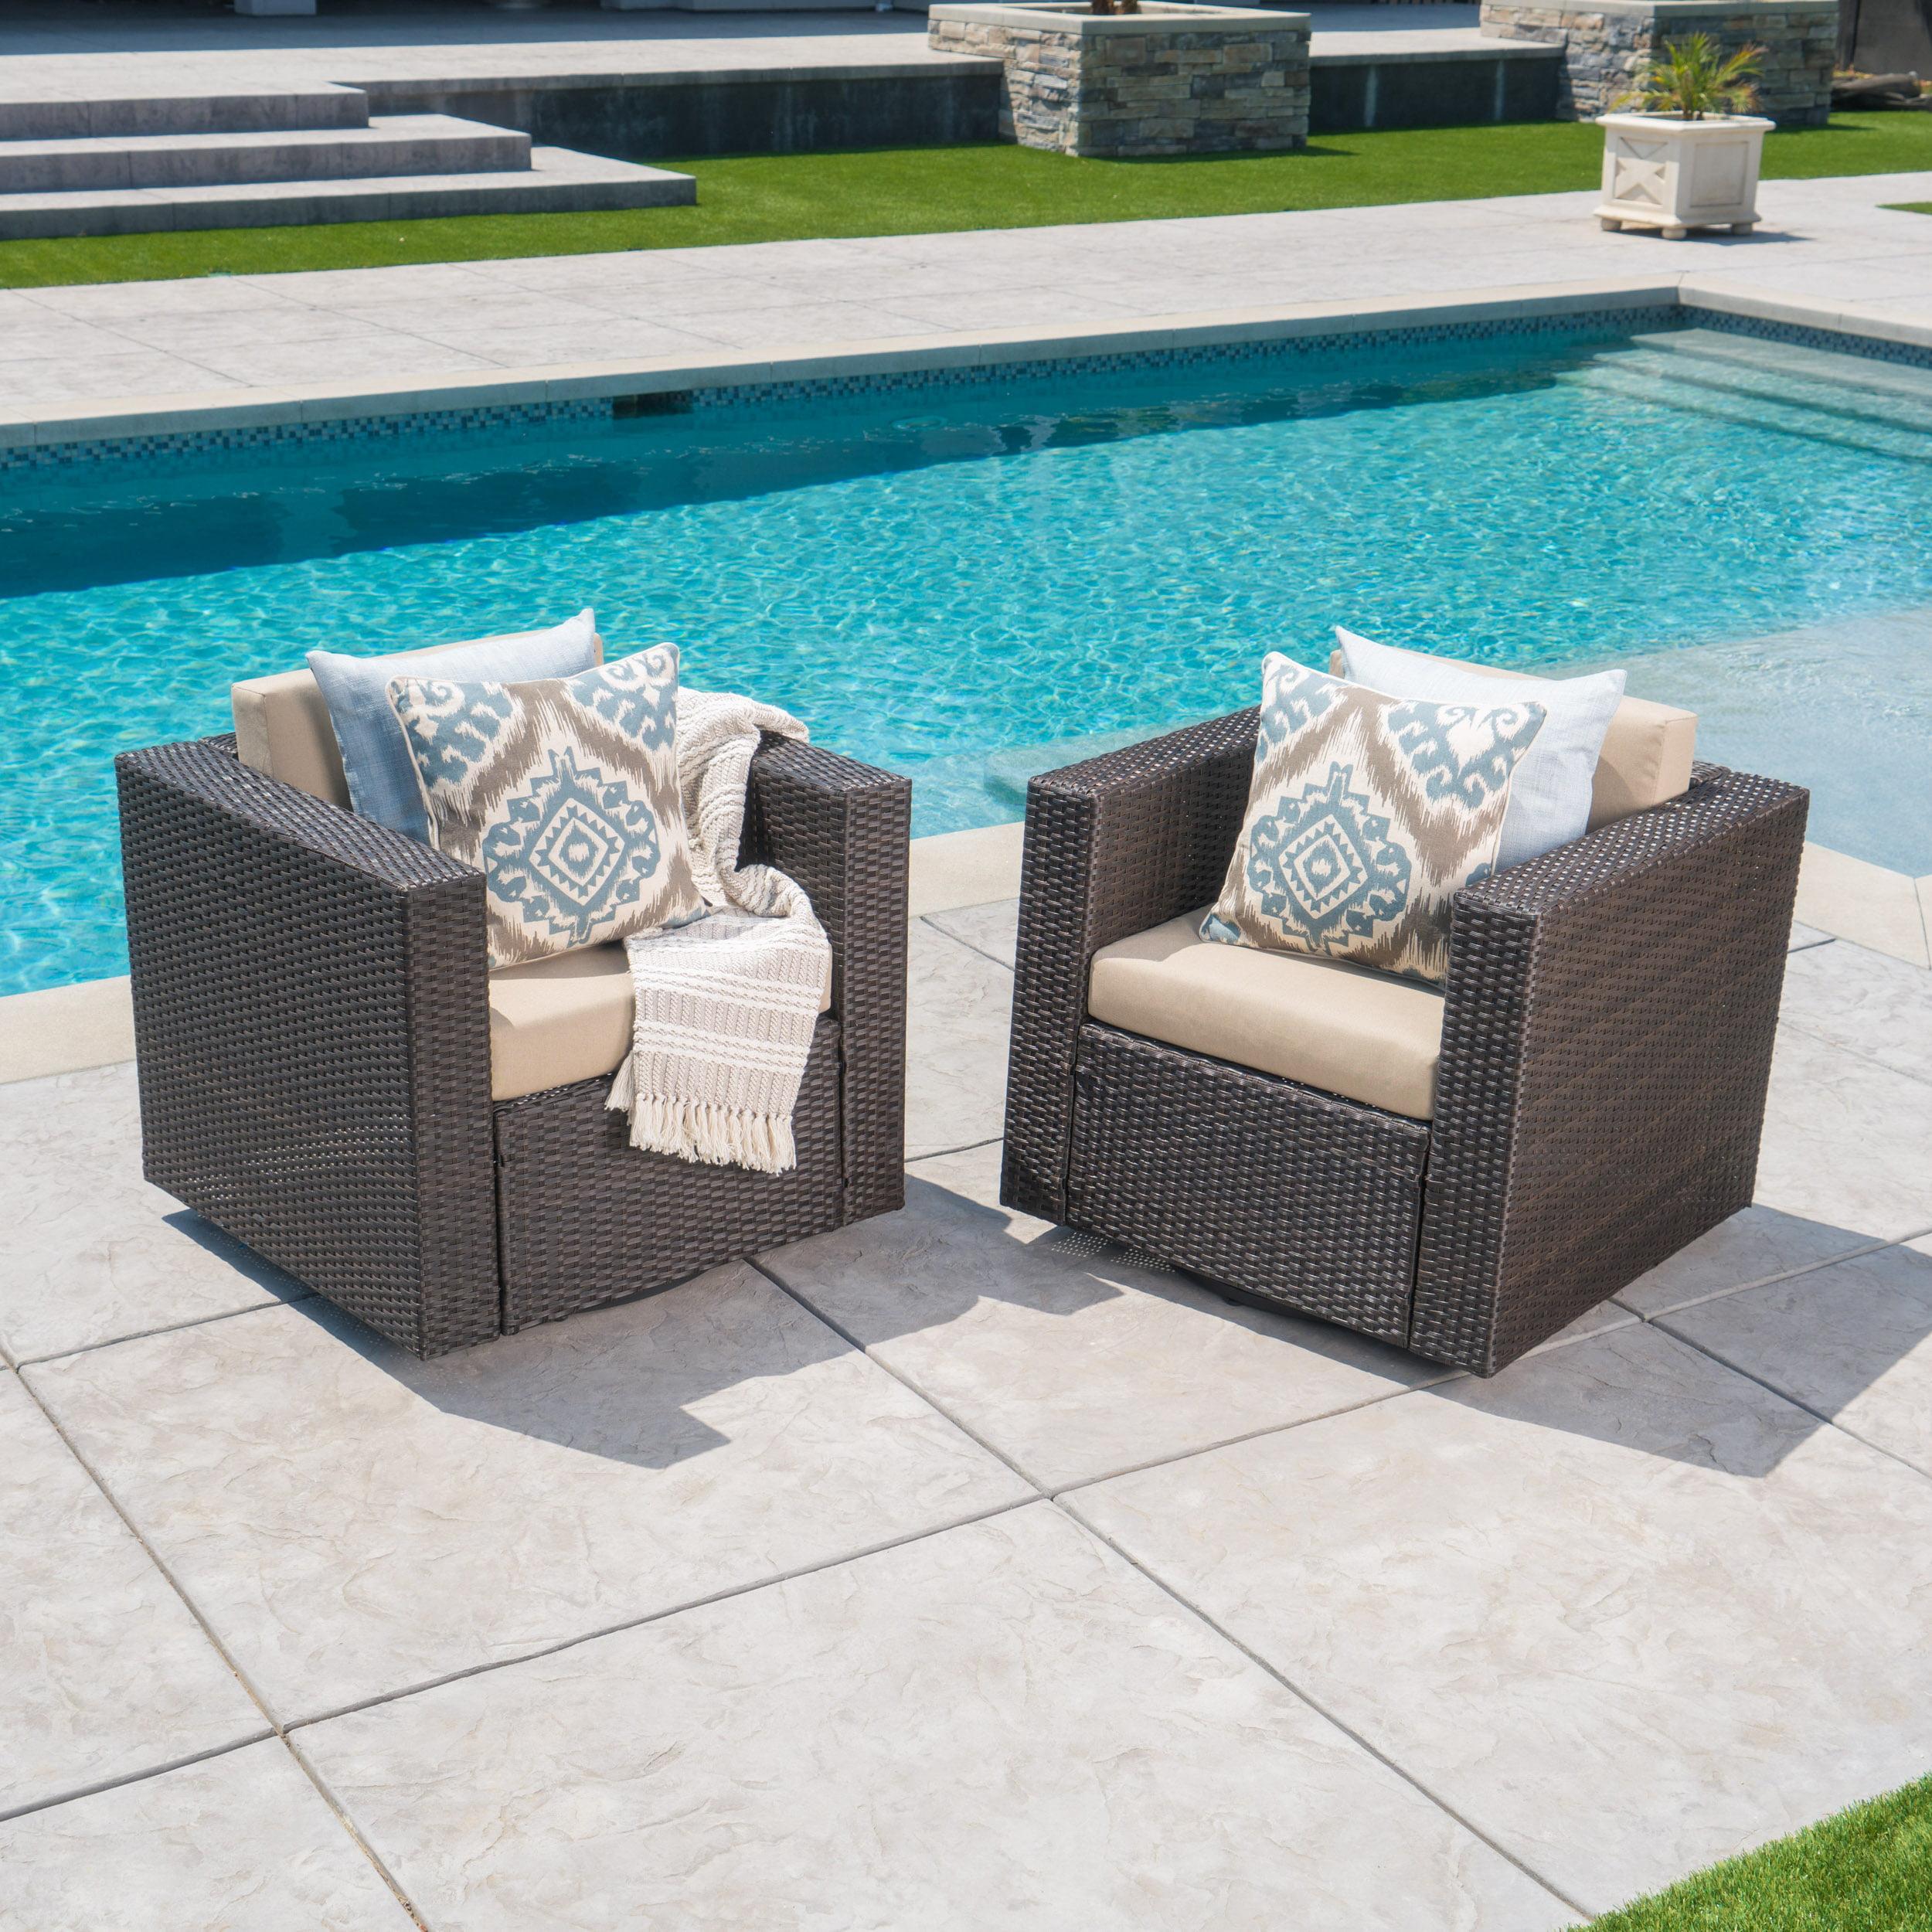 Cascada Outdoor Wicker Swivel Club Chairs with Cushions, Set of 2, Dark Brown, Beige